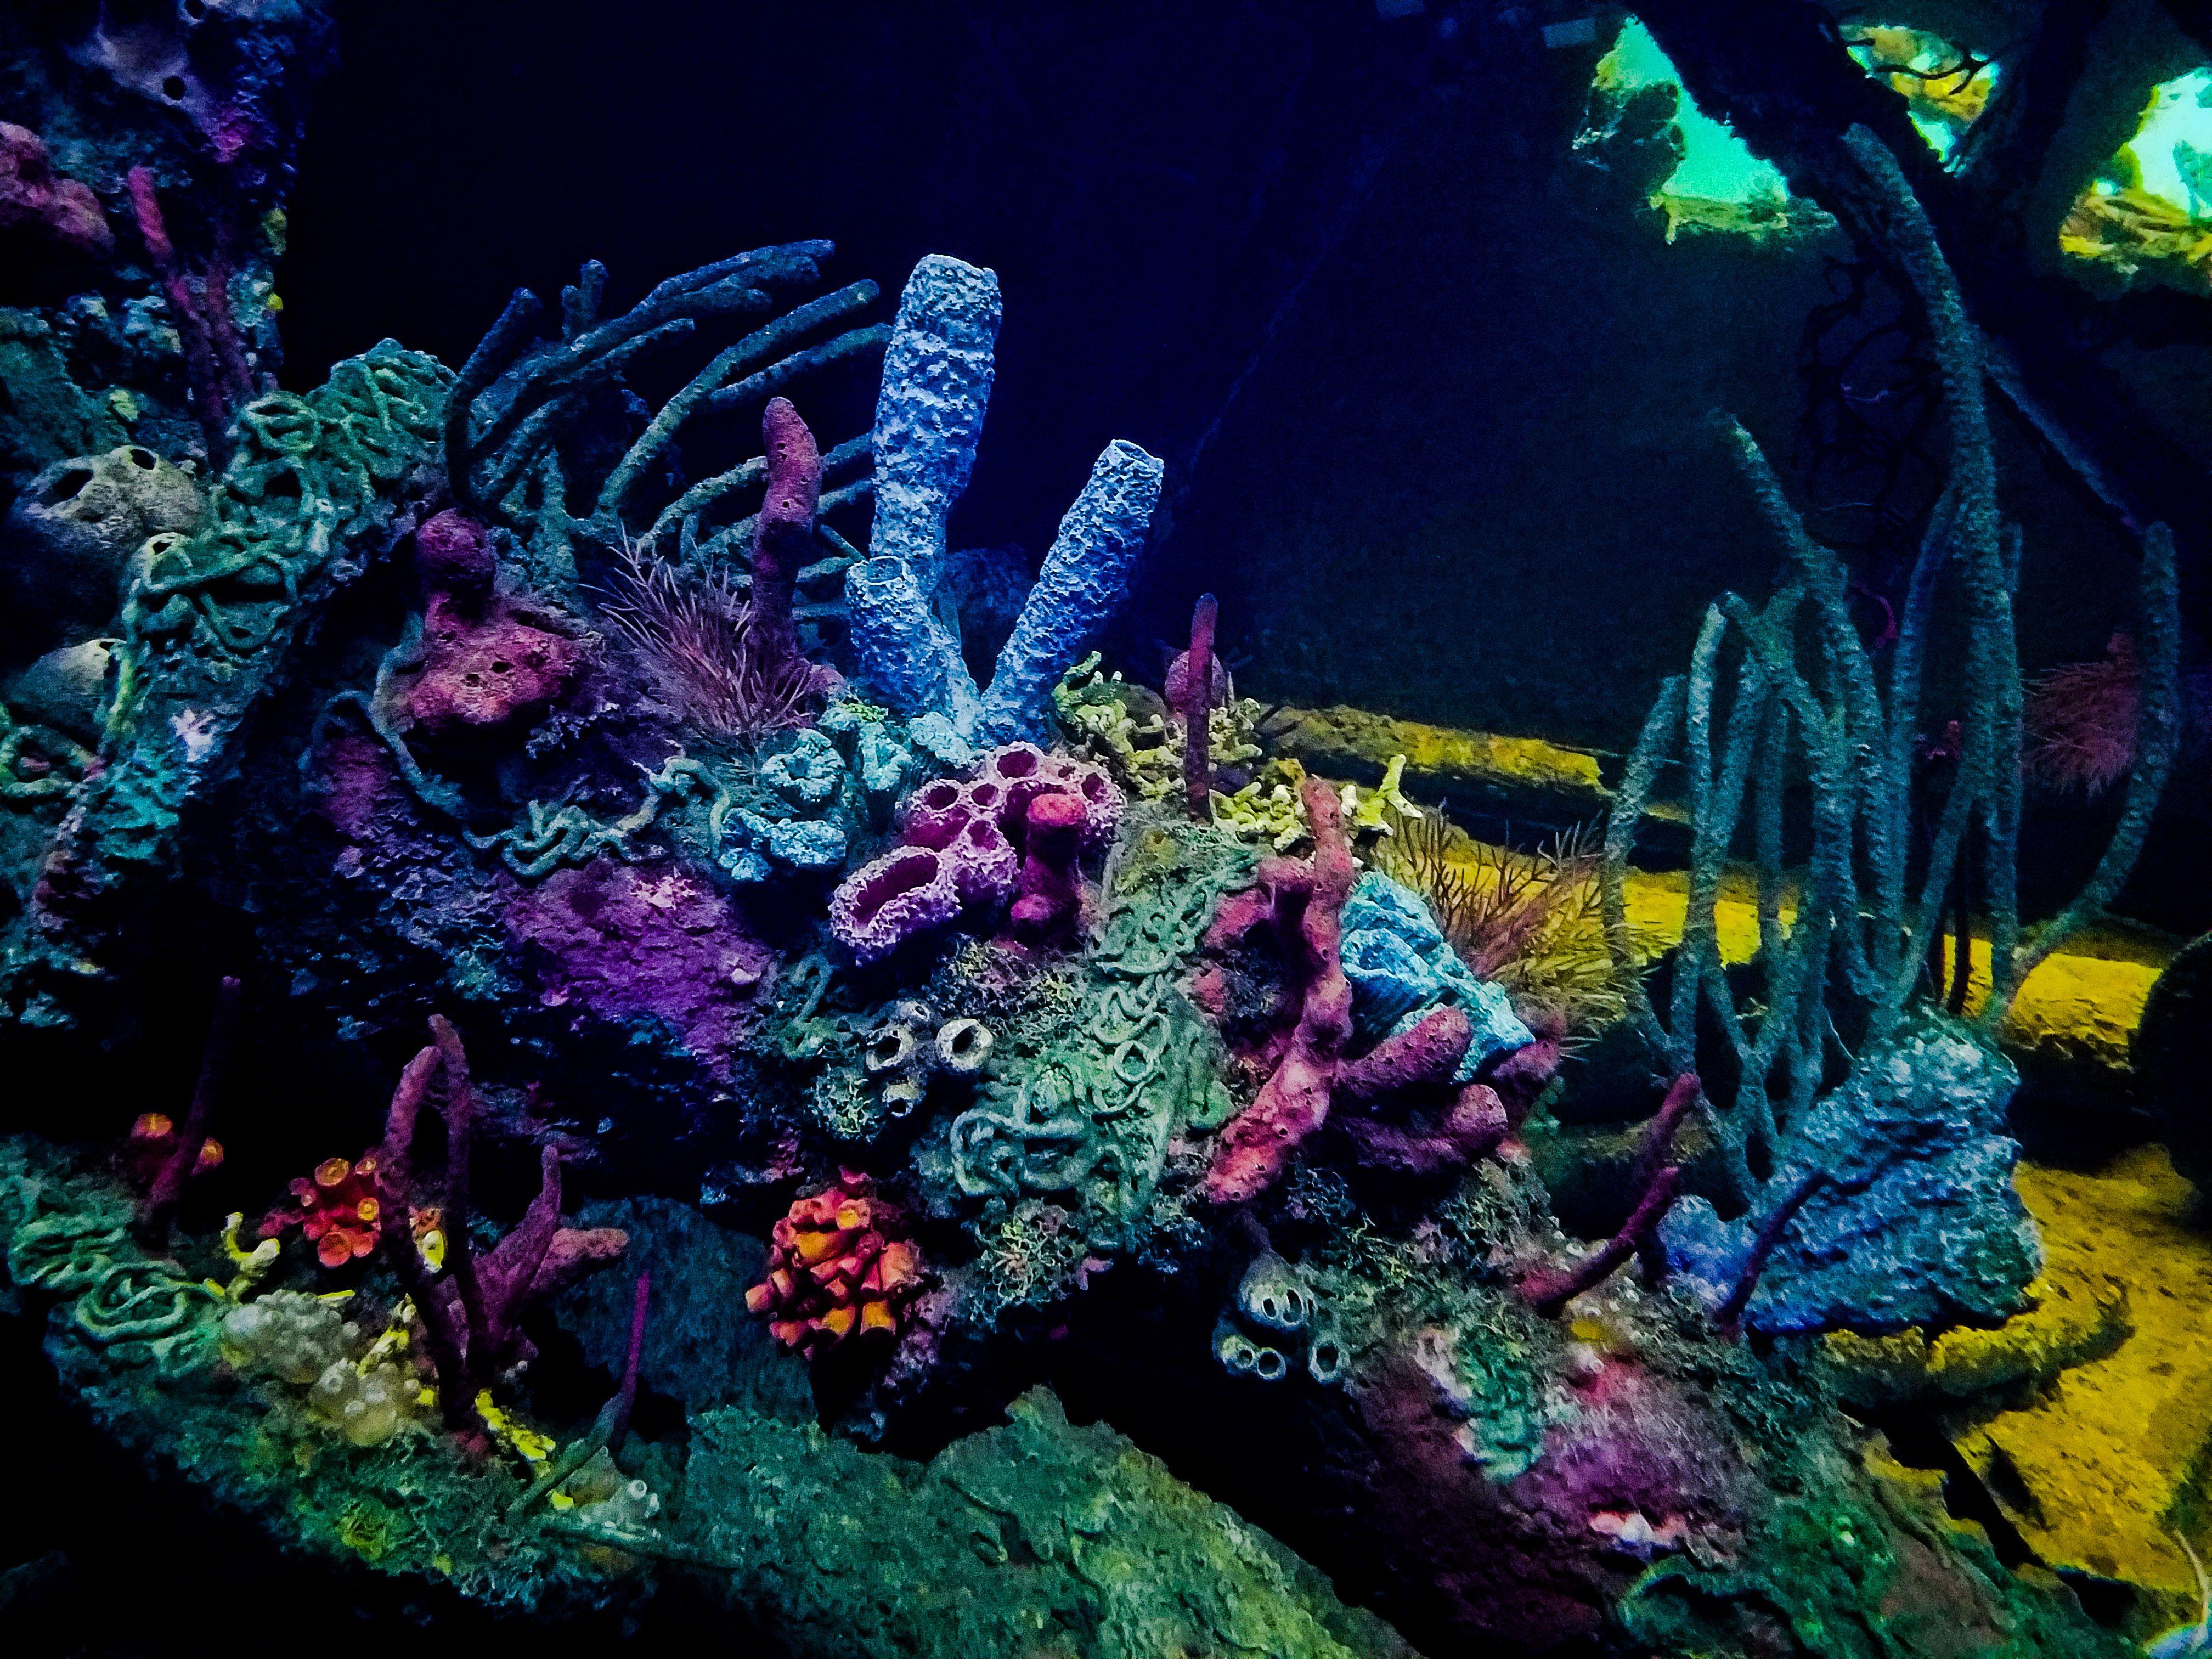 National Aquarium in Baltimore Visitors Guide